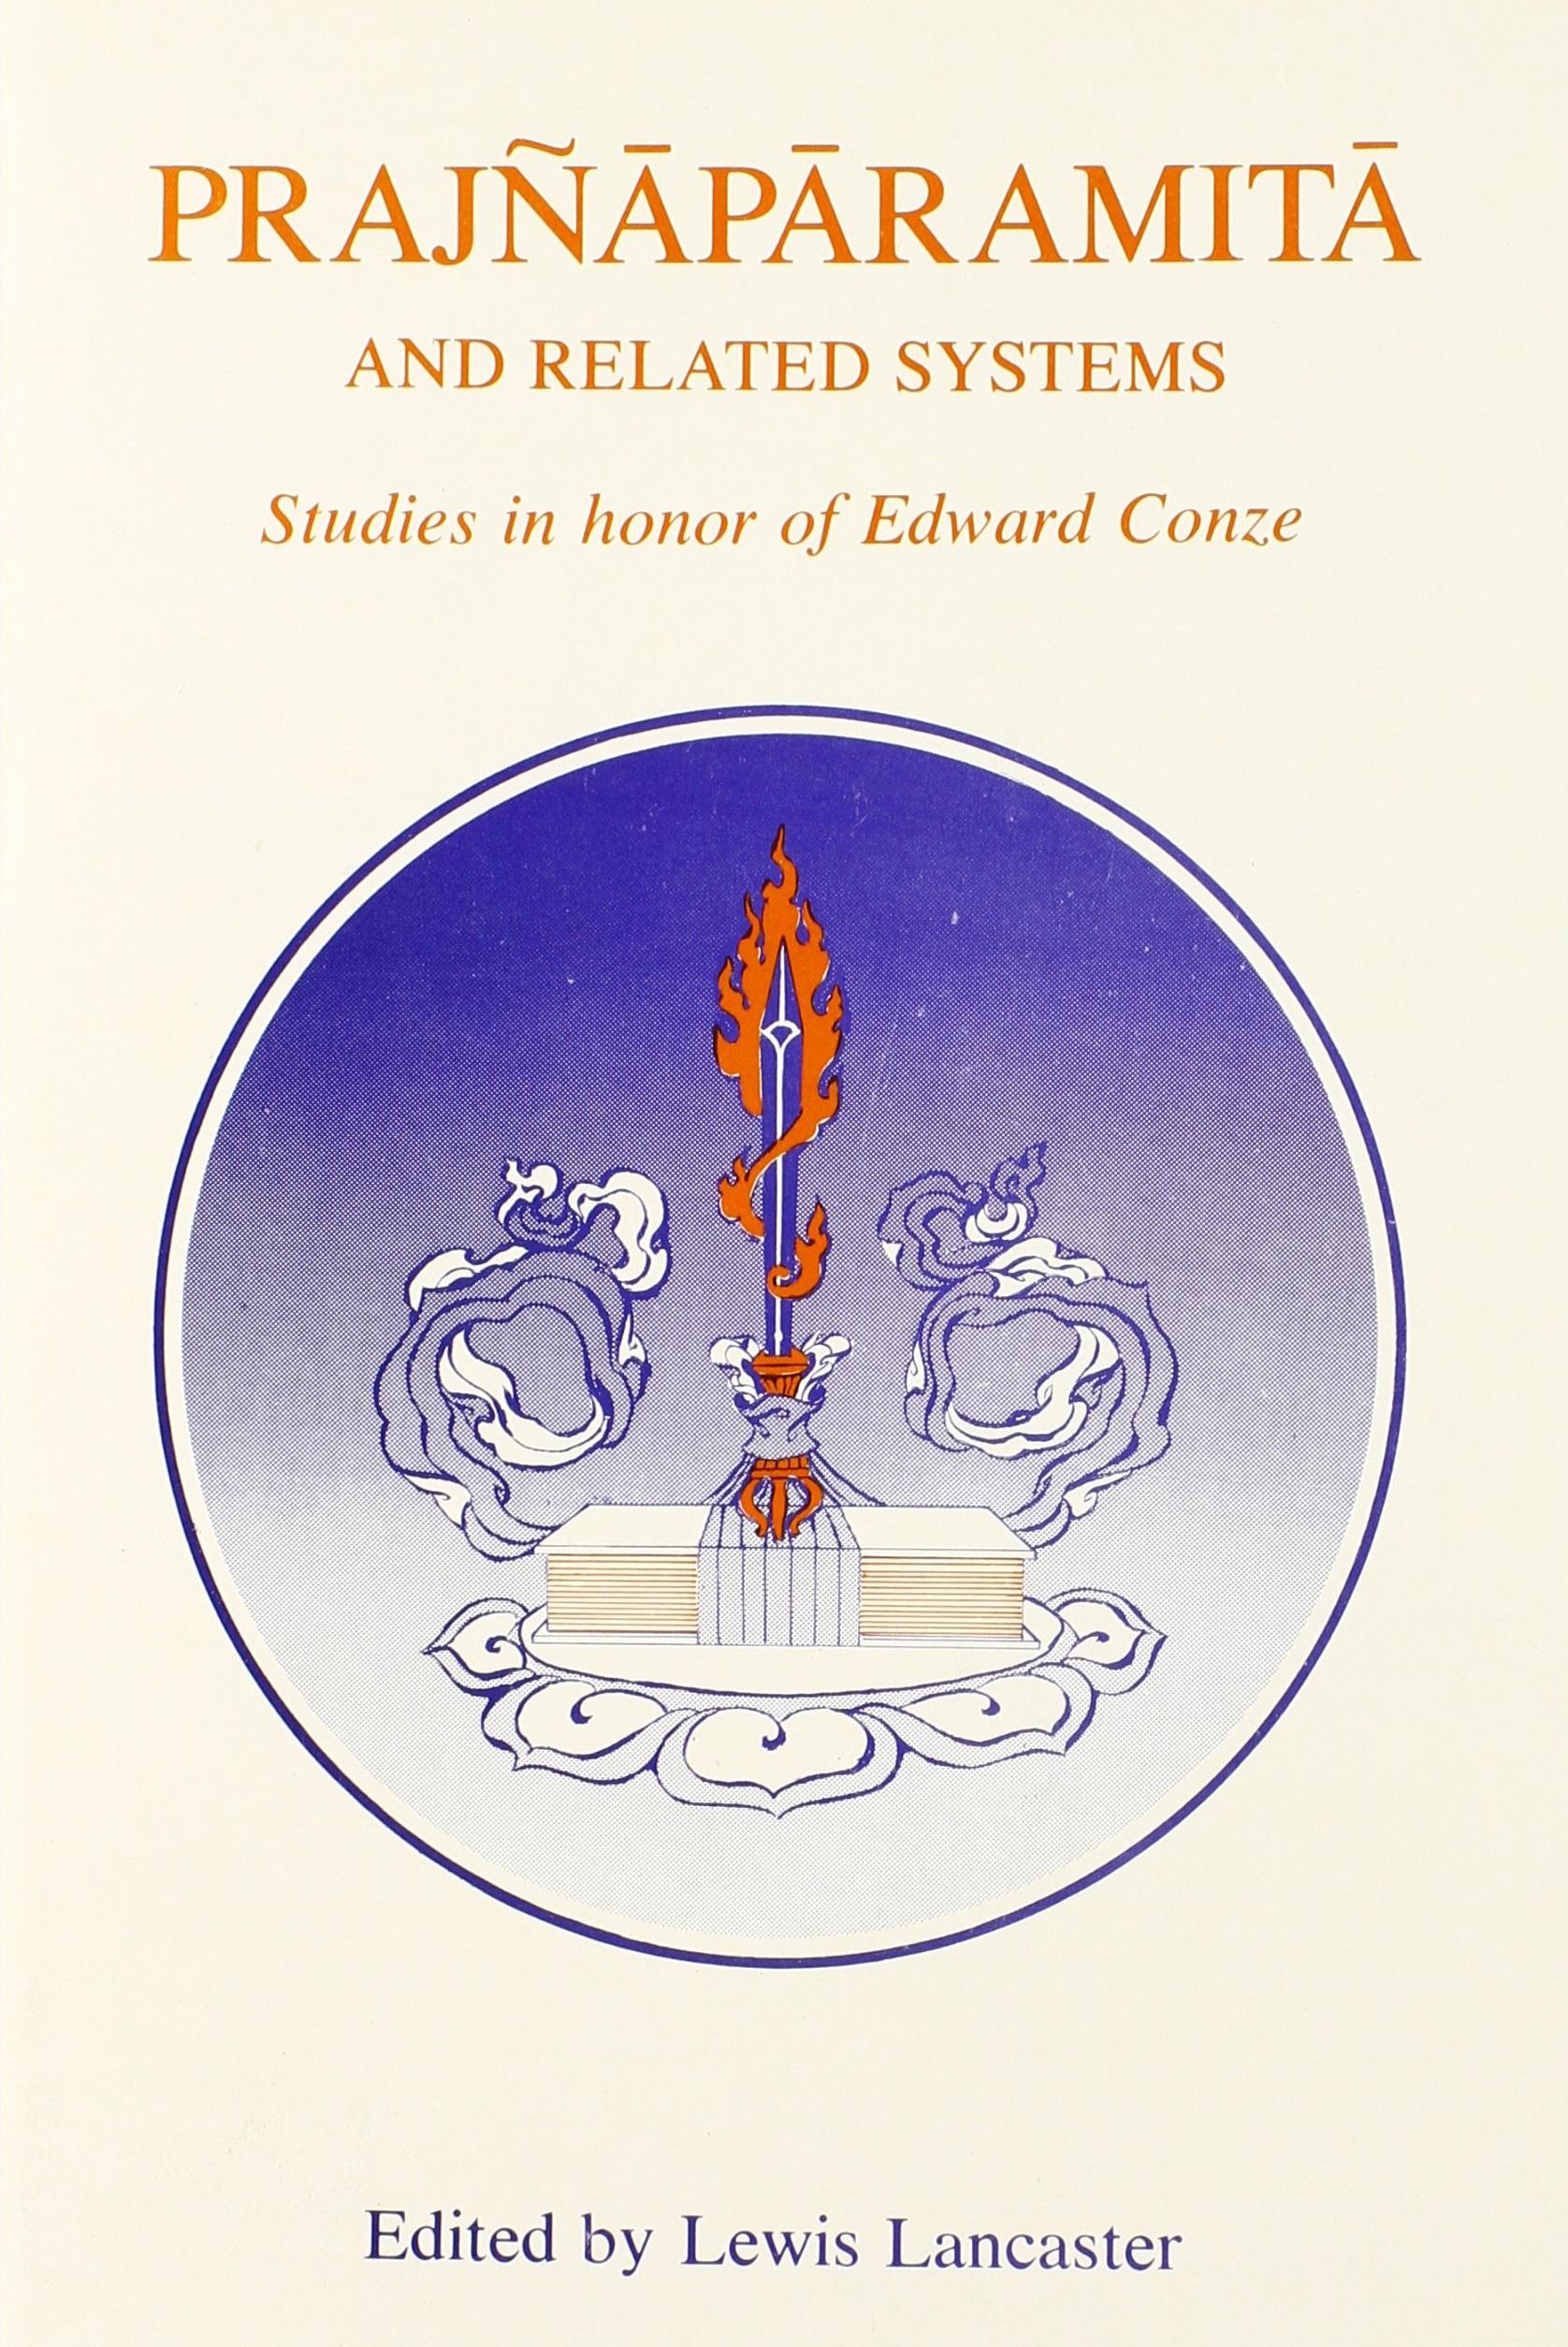 Lancaster Prajnaparamita cover art